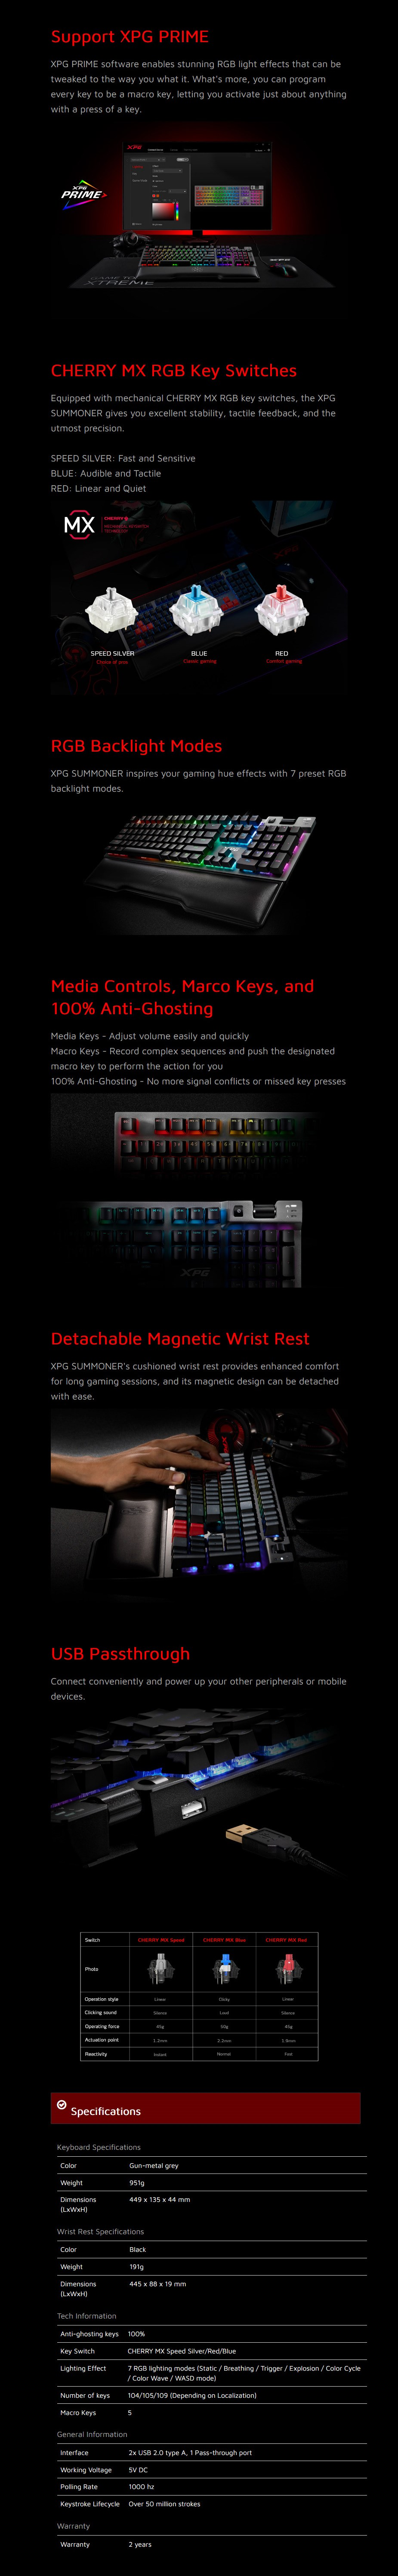 ADATA XPG SUMMONER RGB Mechanical Gaming Keyboard - Overview 1